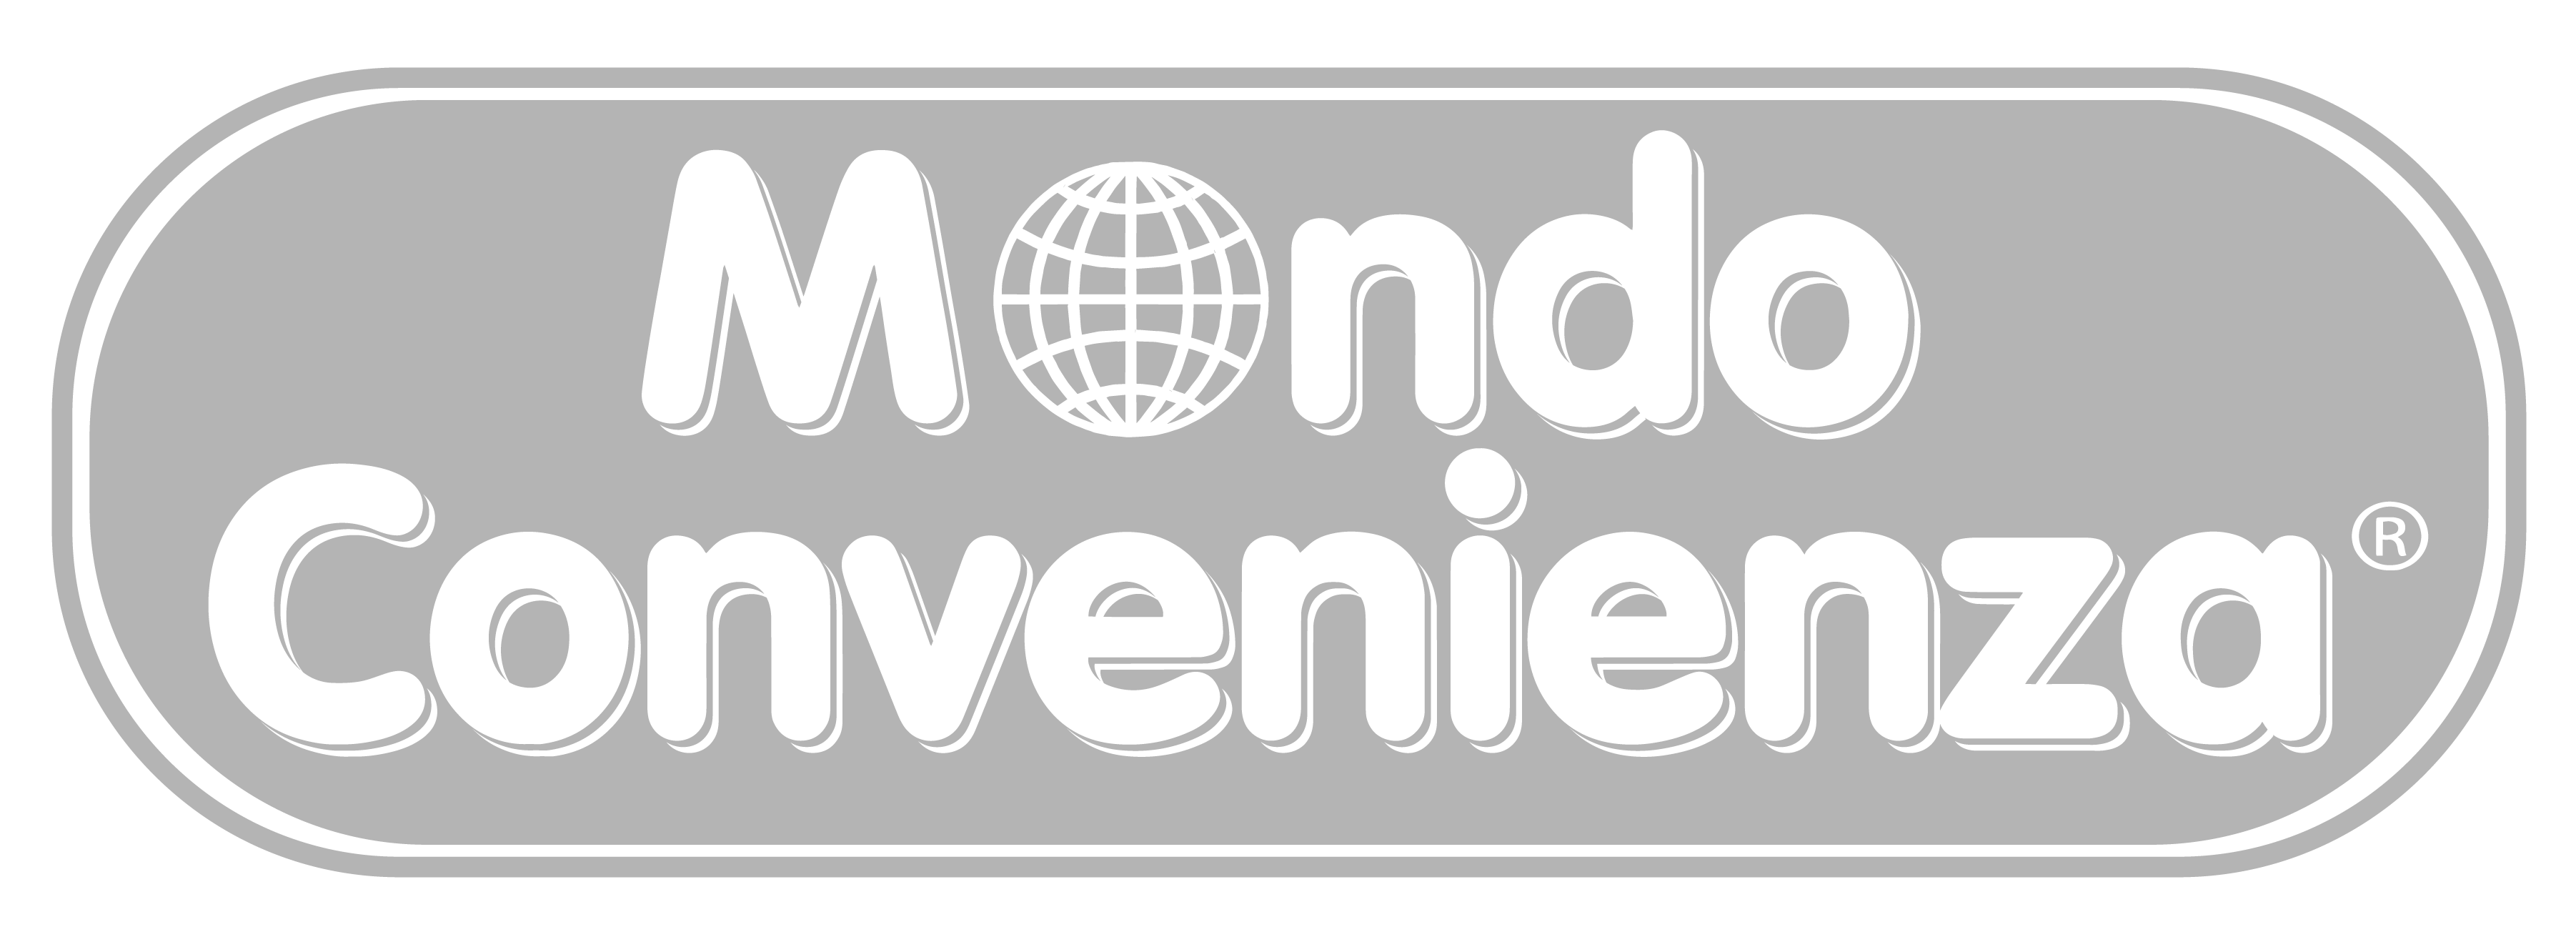 Customer Microlog MondoConvenienza